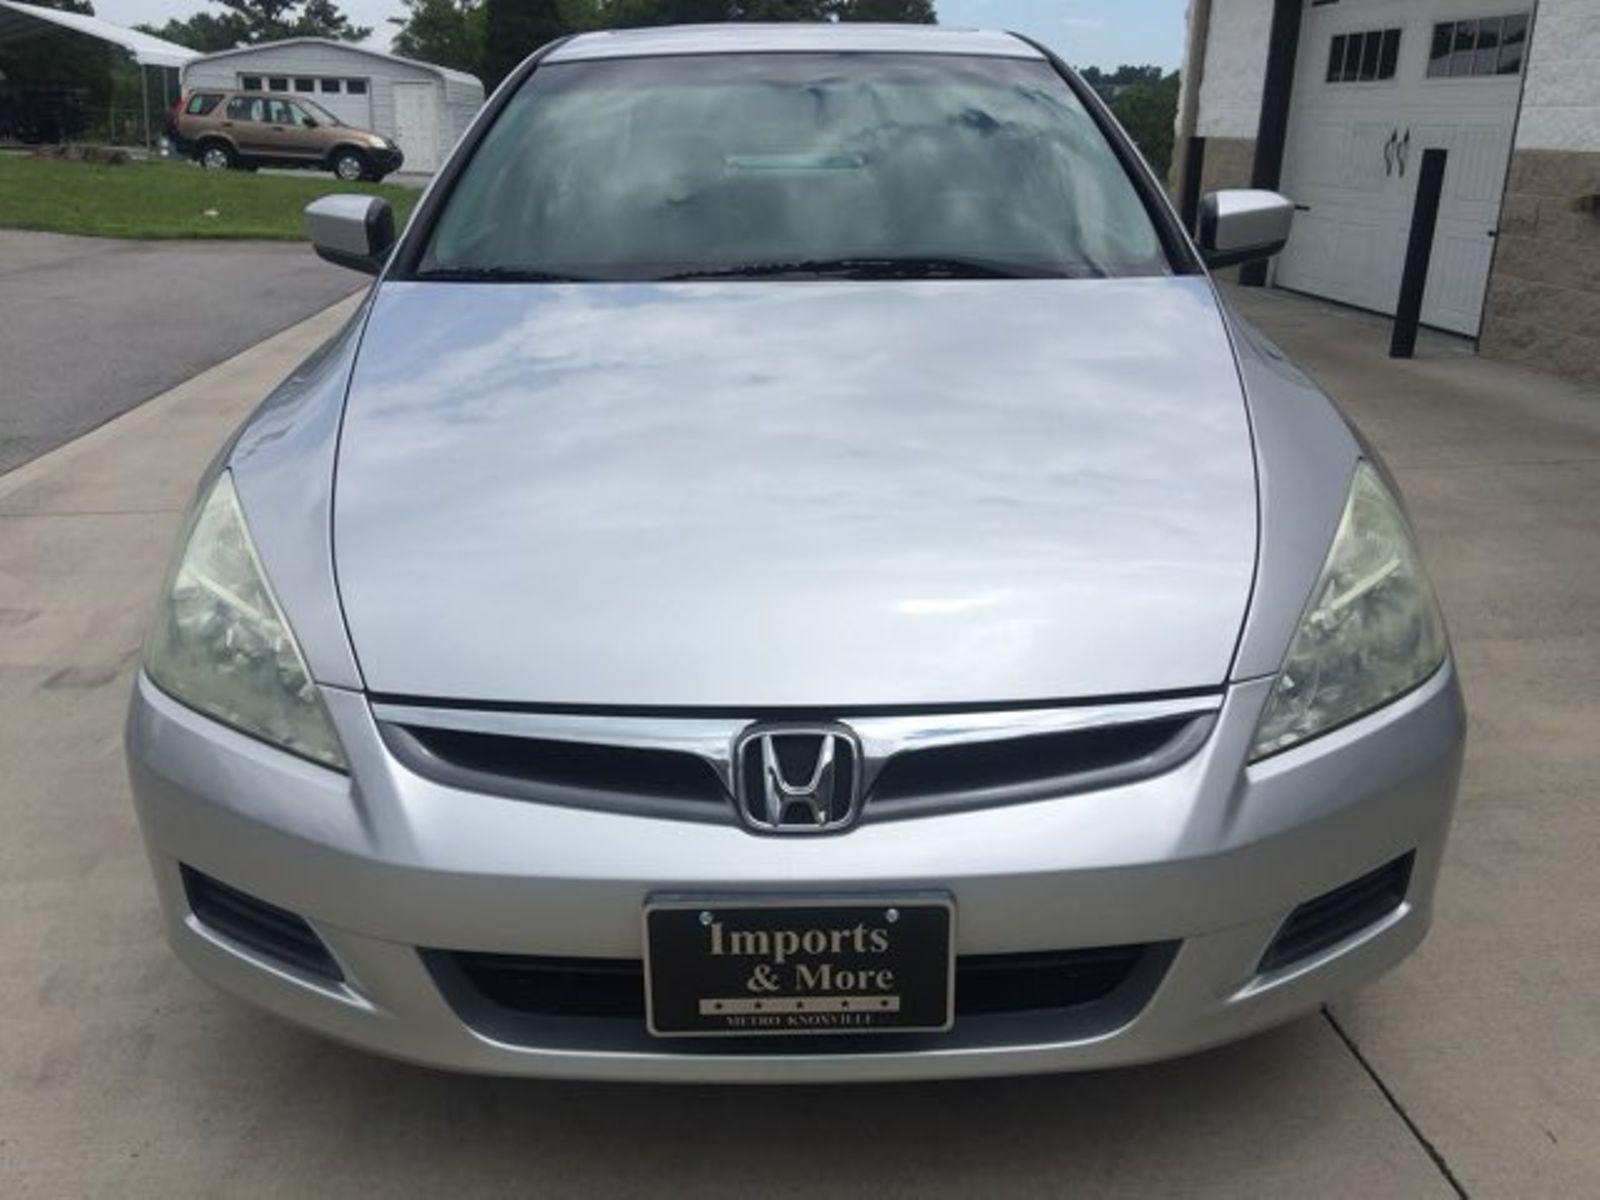 2007 Honda Accord EX-L V6 Imports and More Inc